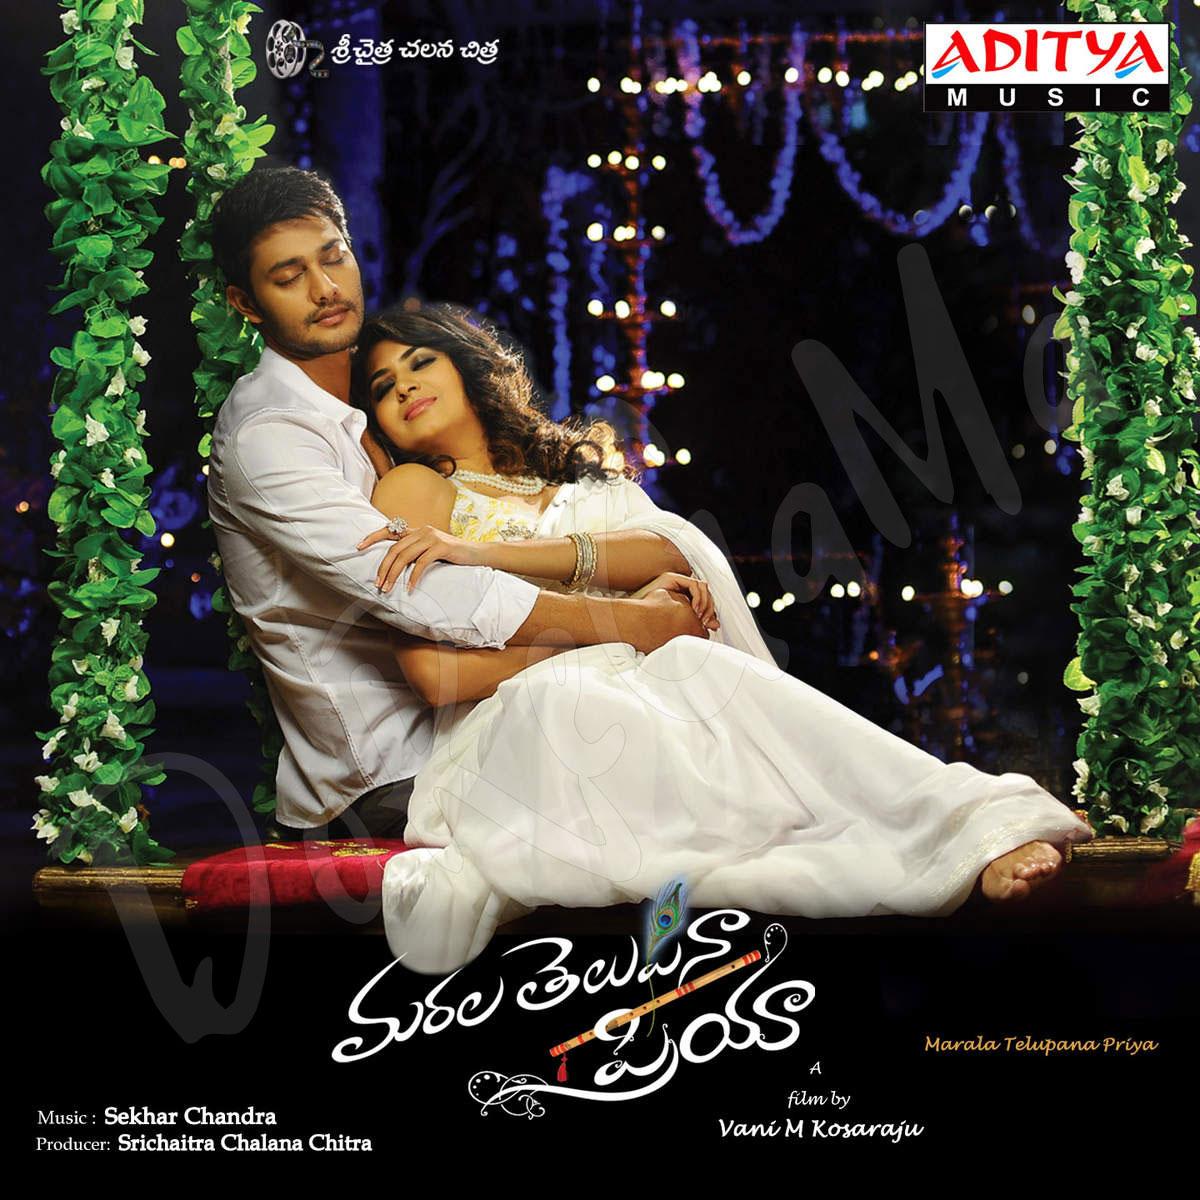 Marala-Telupana-Priya-Telugu-CD-FRont-Cover-Poster-Wallpaper